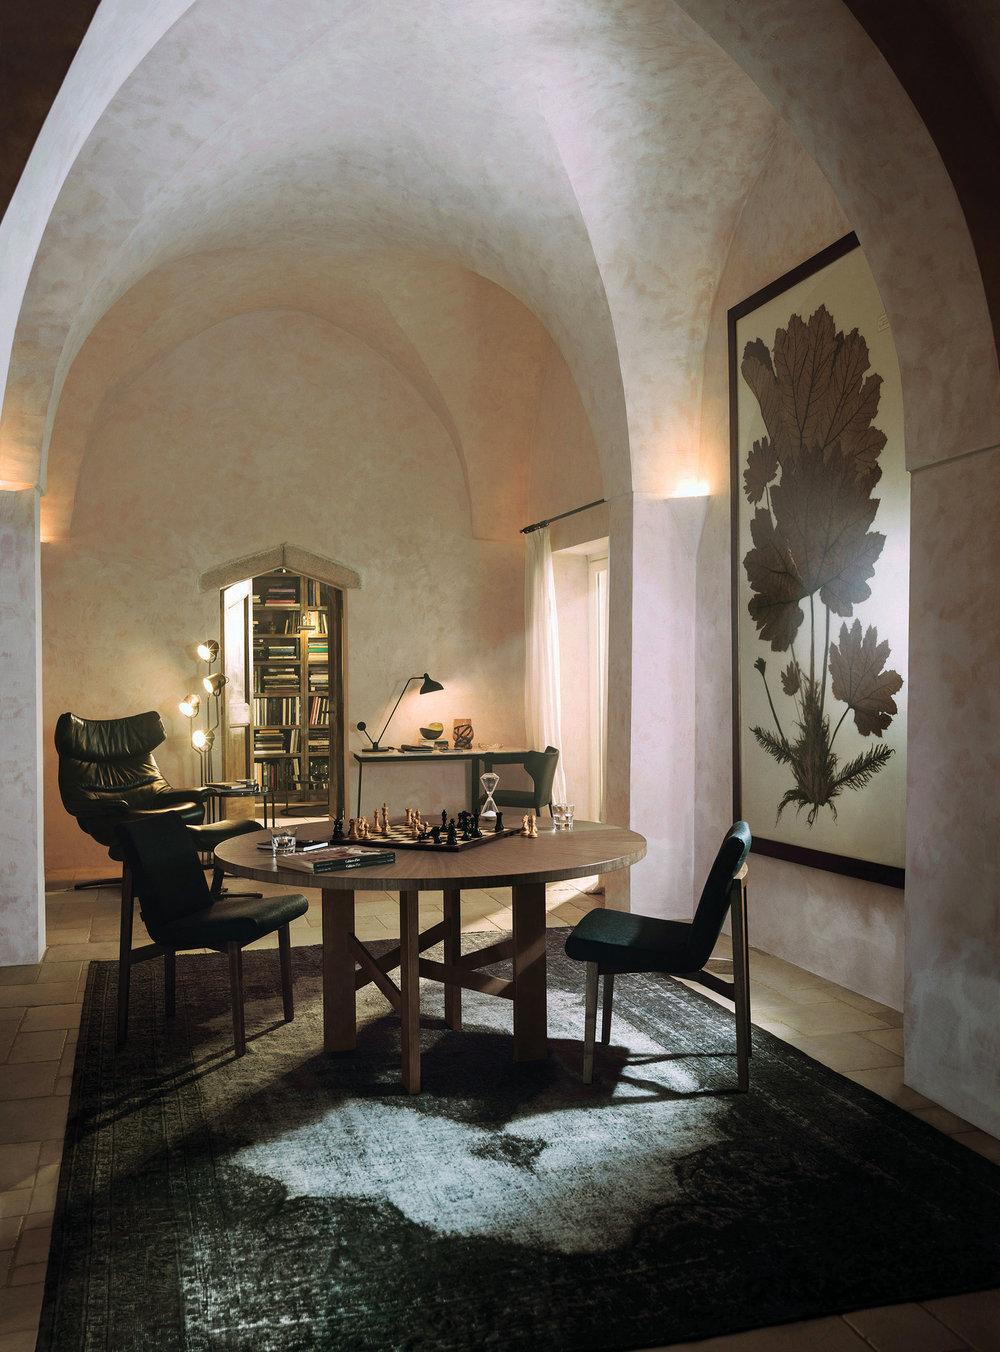 Natuzzi Accademia Table, price upon request 現代造型木質圓桌 At Sandy's Furniture, (604) 520-0800,  sandysfurniture.ca